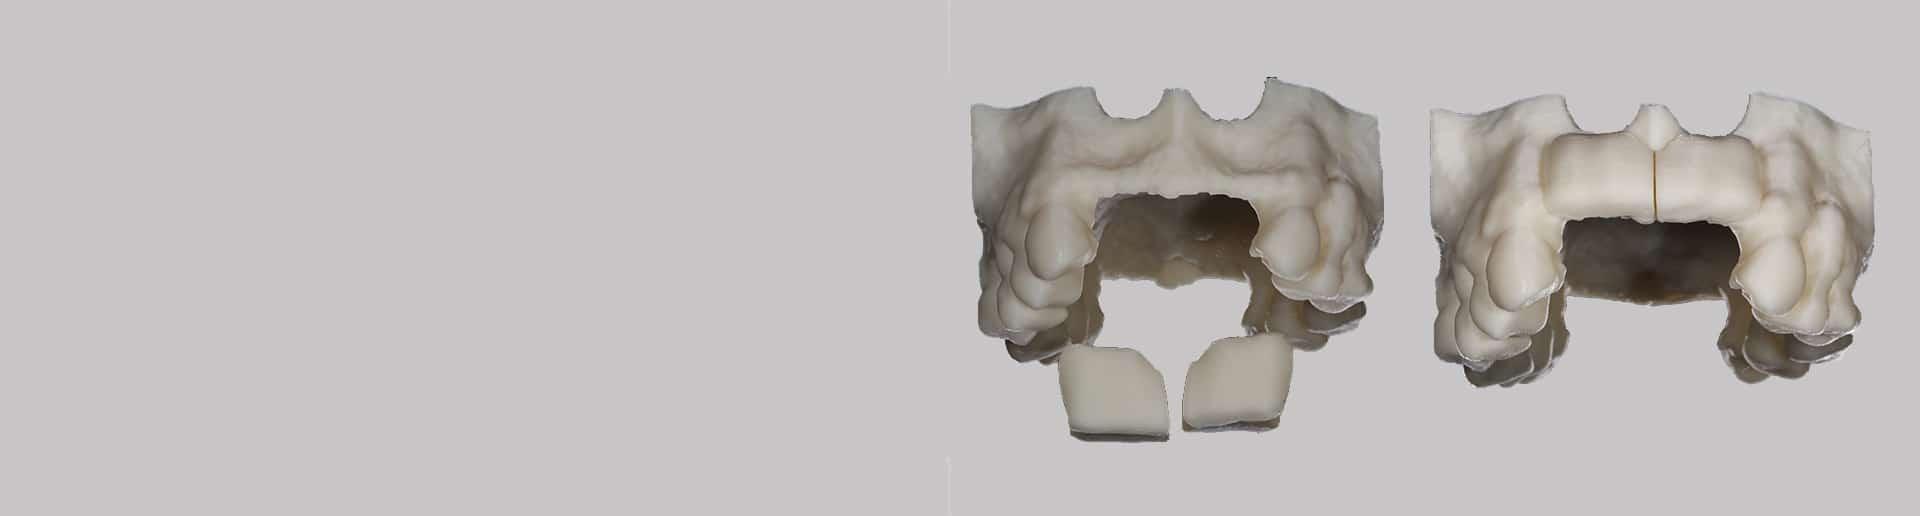 Bone and tissue regeneration